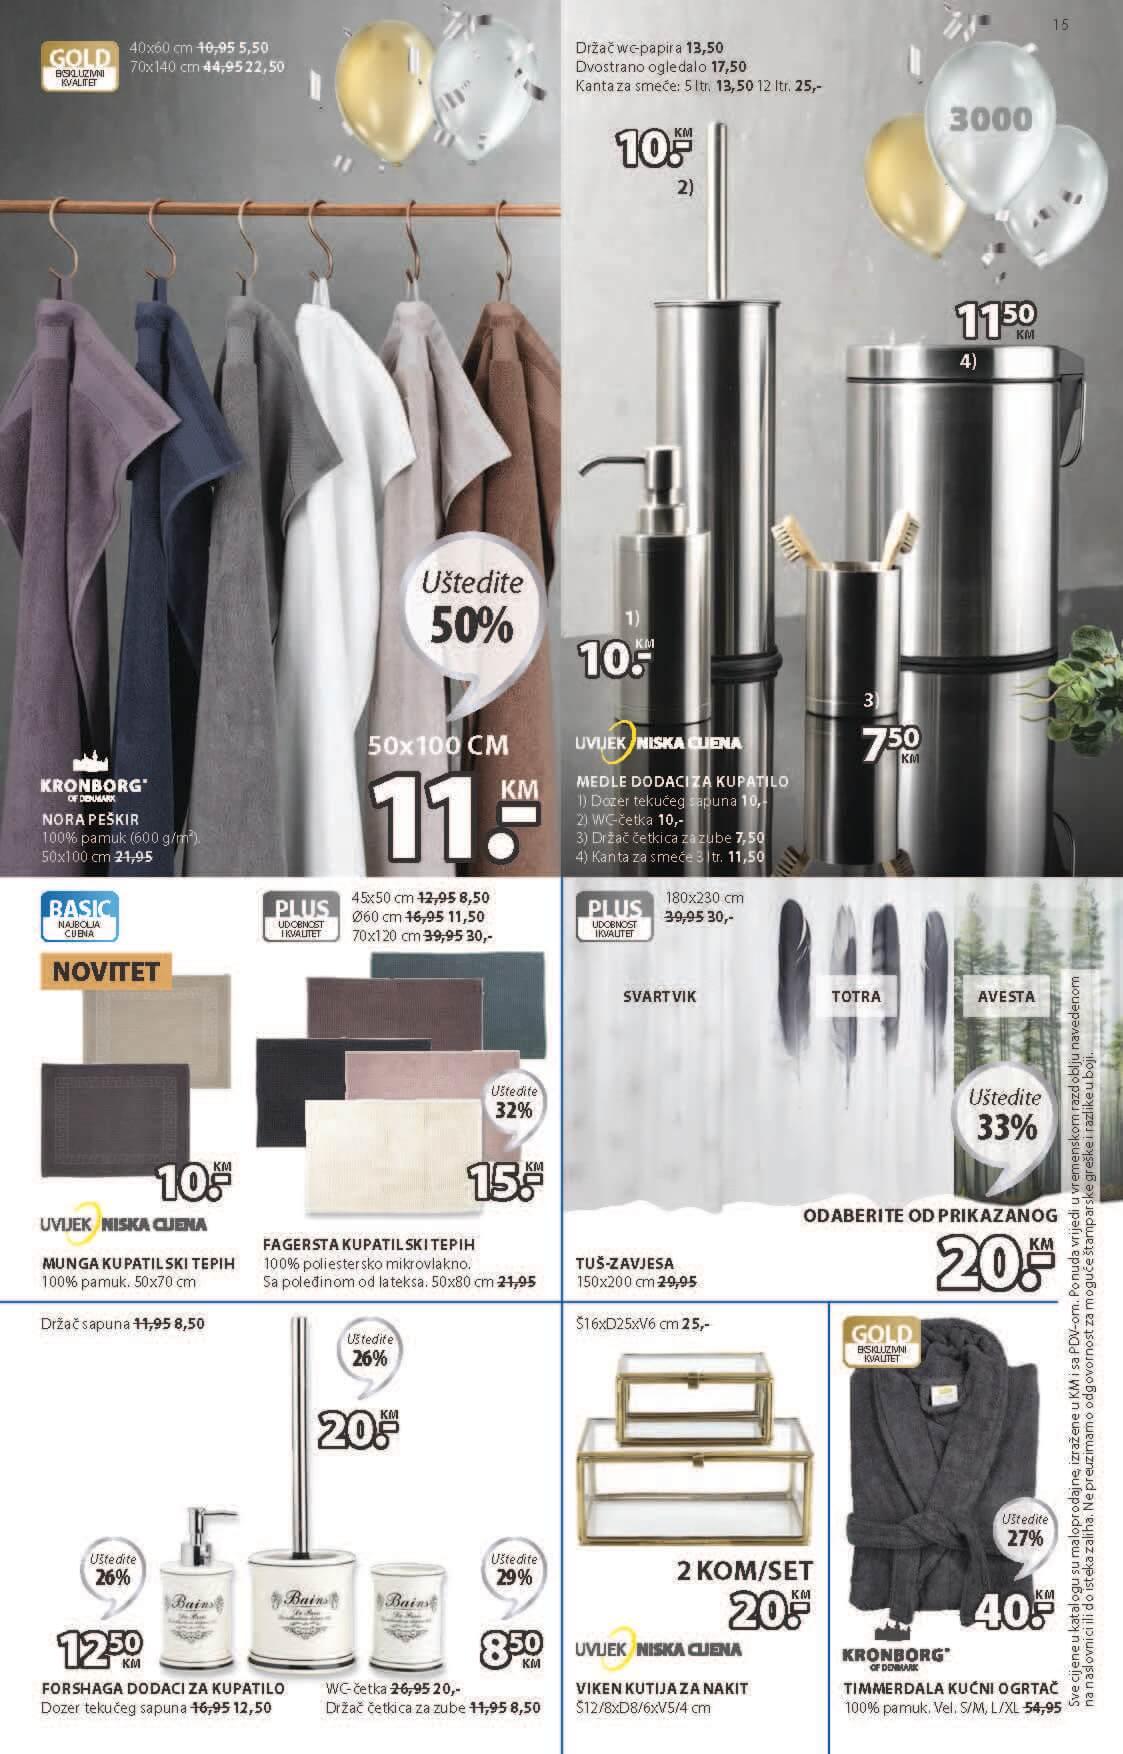 JYSK Katalog Akcijska ponuda MAJ 13.05.2021. 26.05.2021 ekatalozi.com Page 16 1